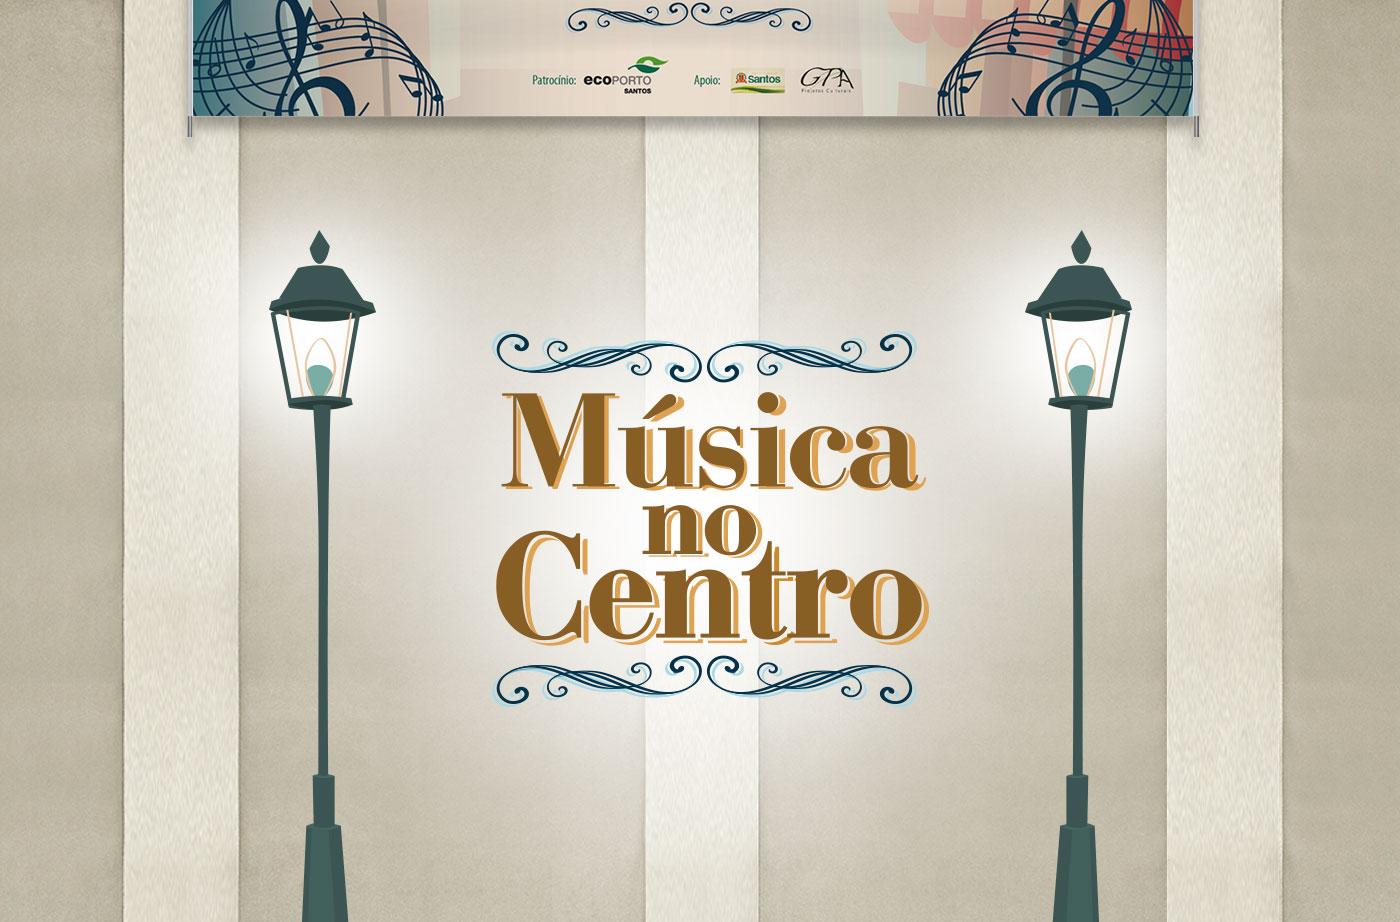 MOCKUP-MUSICA-CENTRO-ECOPORTO-BEHANCE_01_06